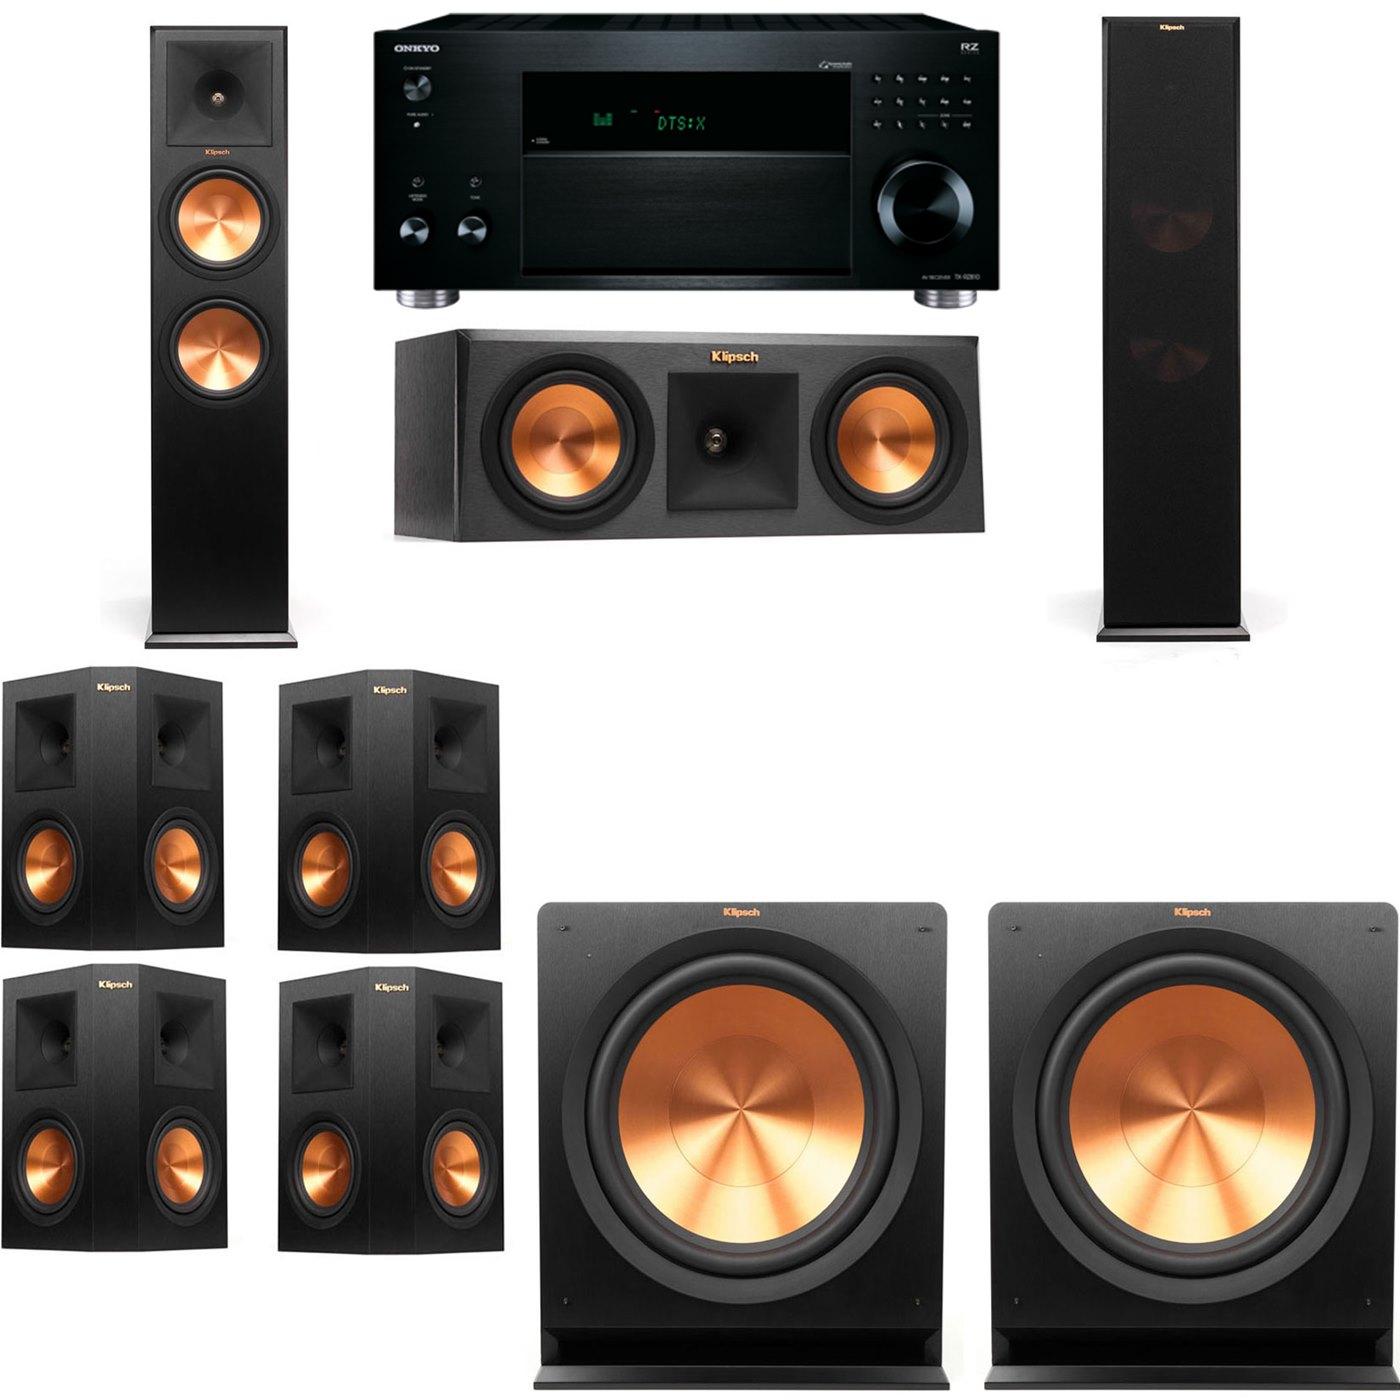 Klipsch RP-280F Tower Speakers-RP-250C-7.2-Onkyo TX-RZ810